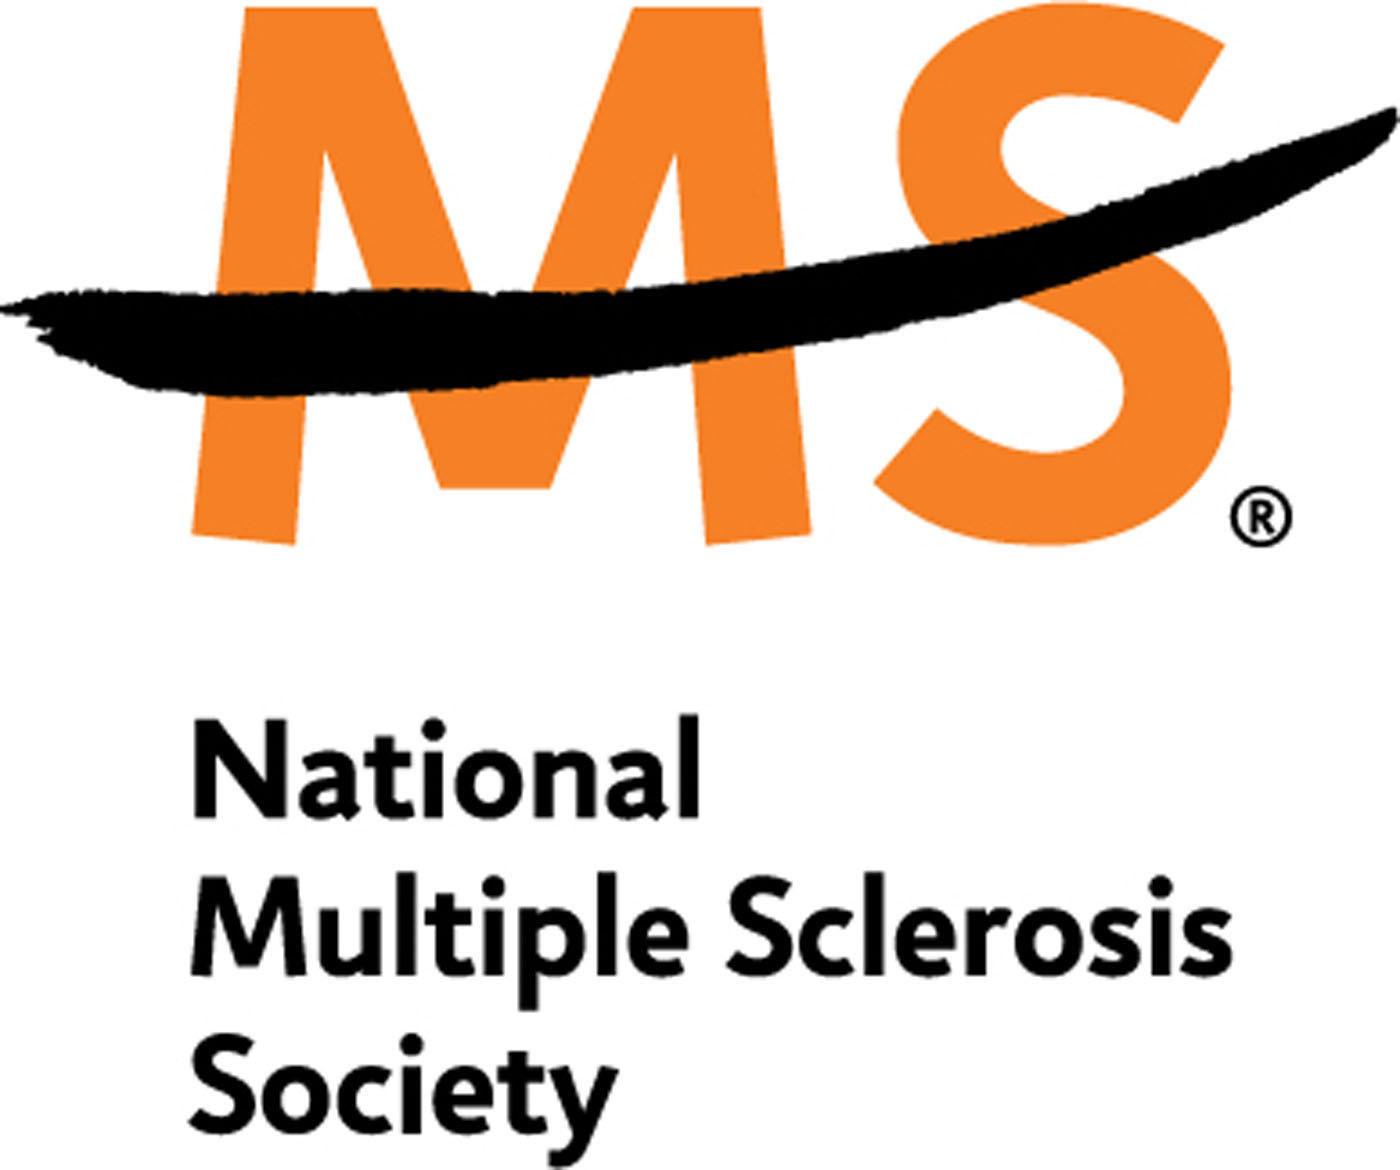 (PRNewsFoto/National Multiple Sclerosis Society) (PRNewsFoto/)